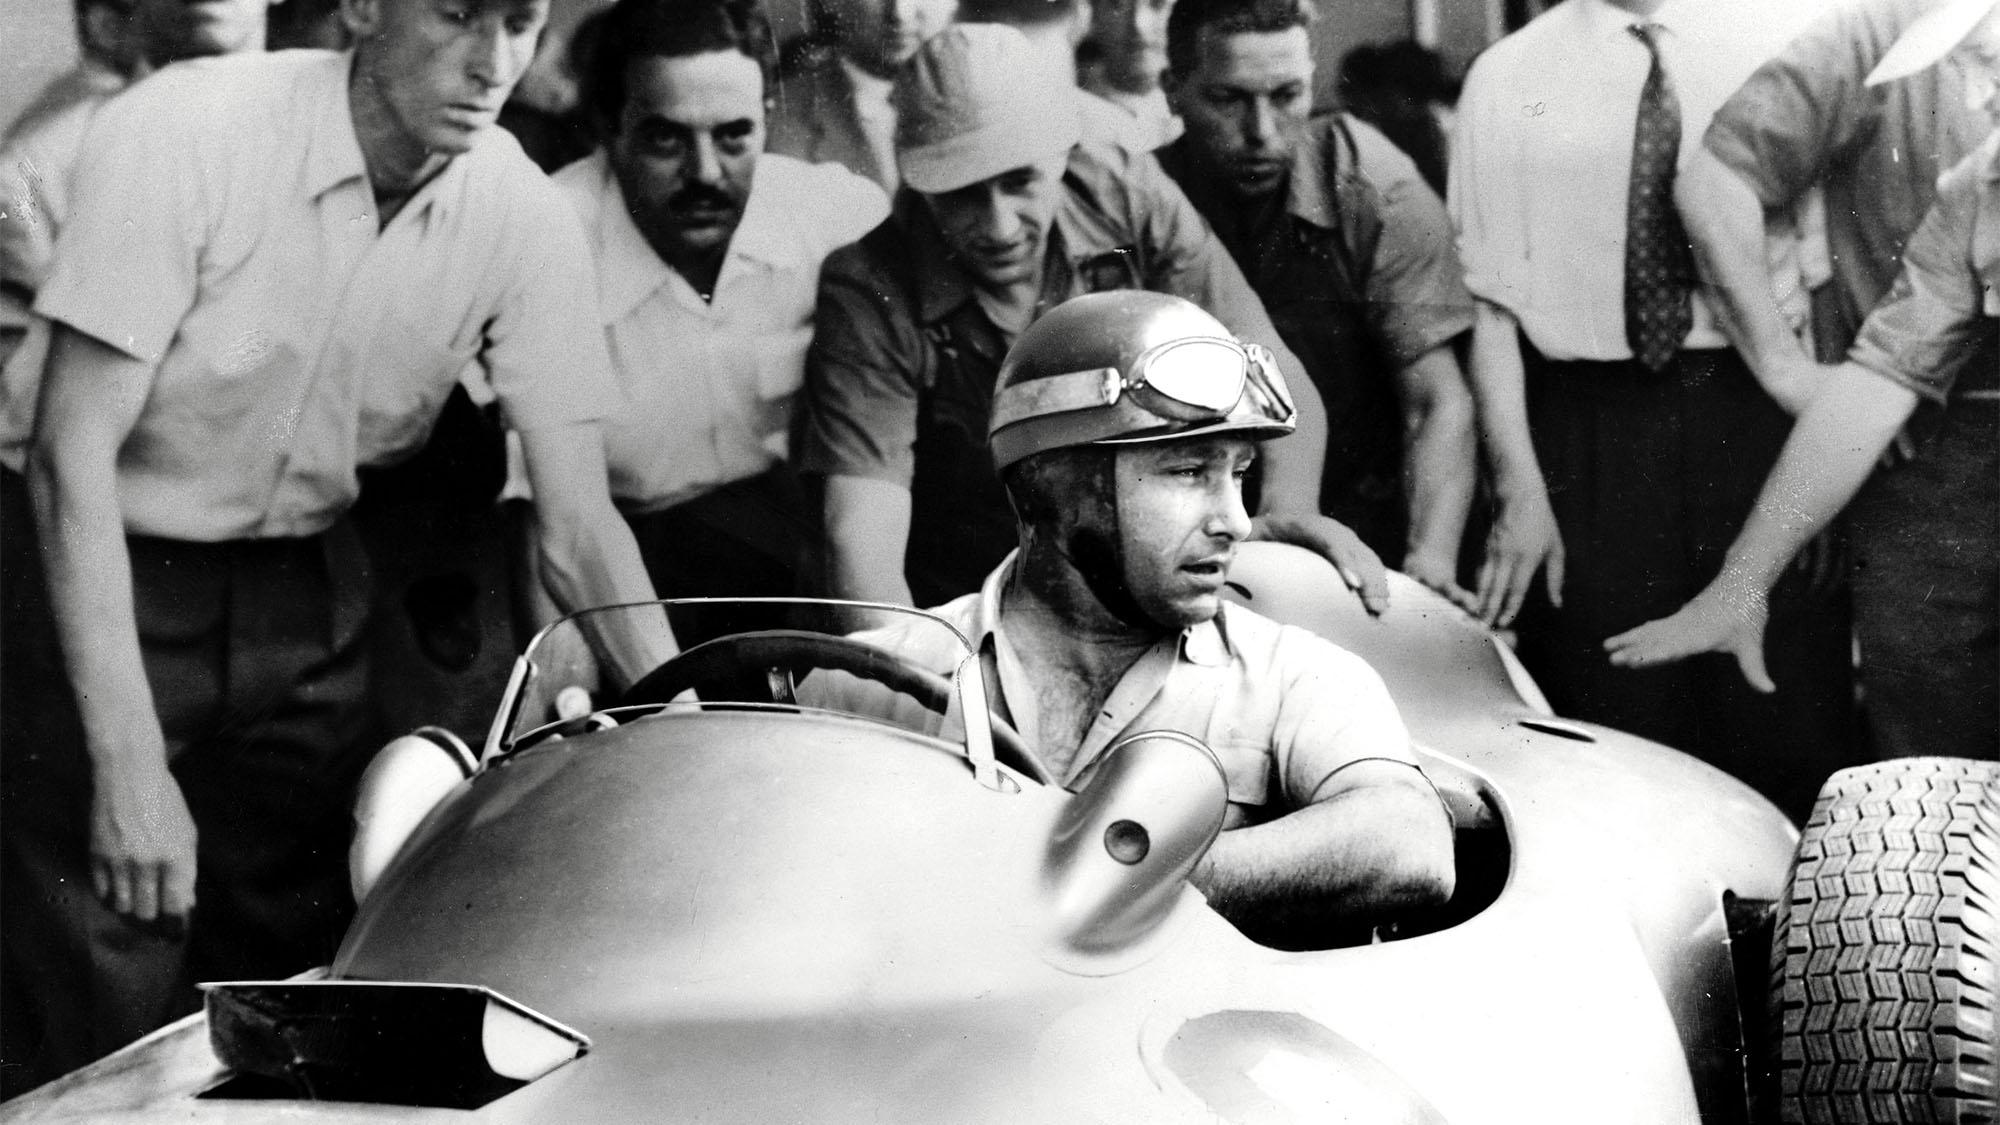 MOTORSPORT - F1 1955 - ARGENTINA GP - BUENOS AIRES - PHOTO: LAT / DPPI JUAN MANUEL FANGIO (ARG) / MERCEDES W196 DAIMLER BENZ - AMBIANCE - PORTRAIT - WINNER